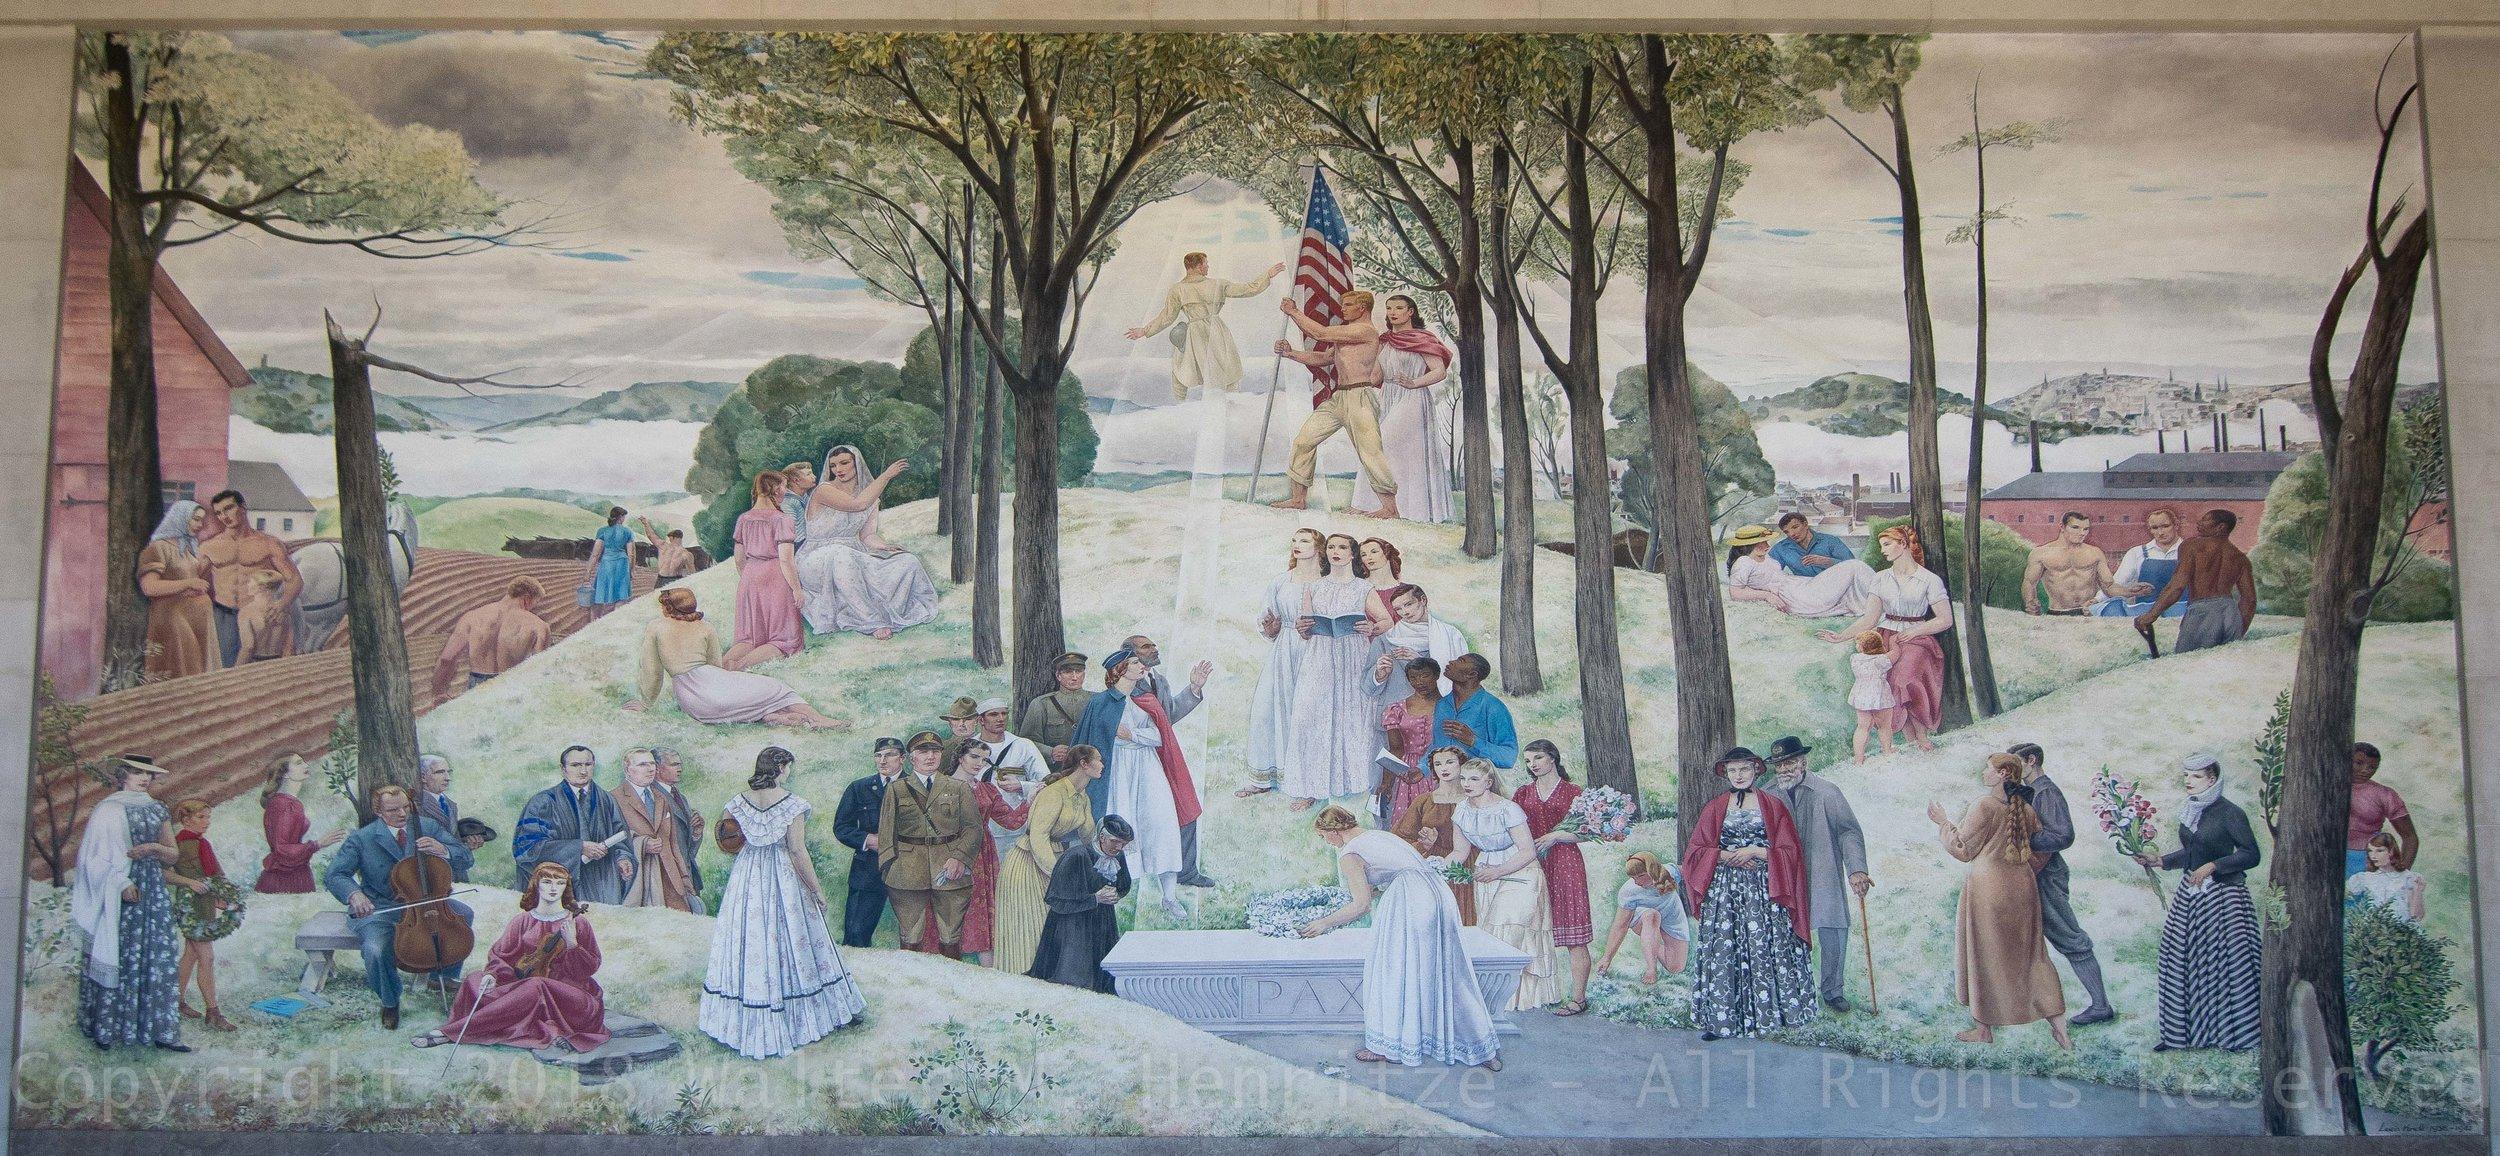 The Central Mural, 57 x 30 Feet